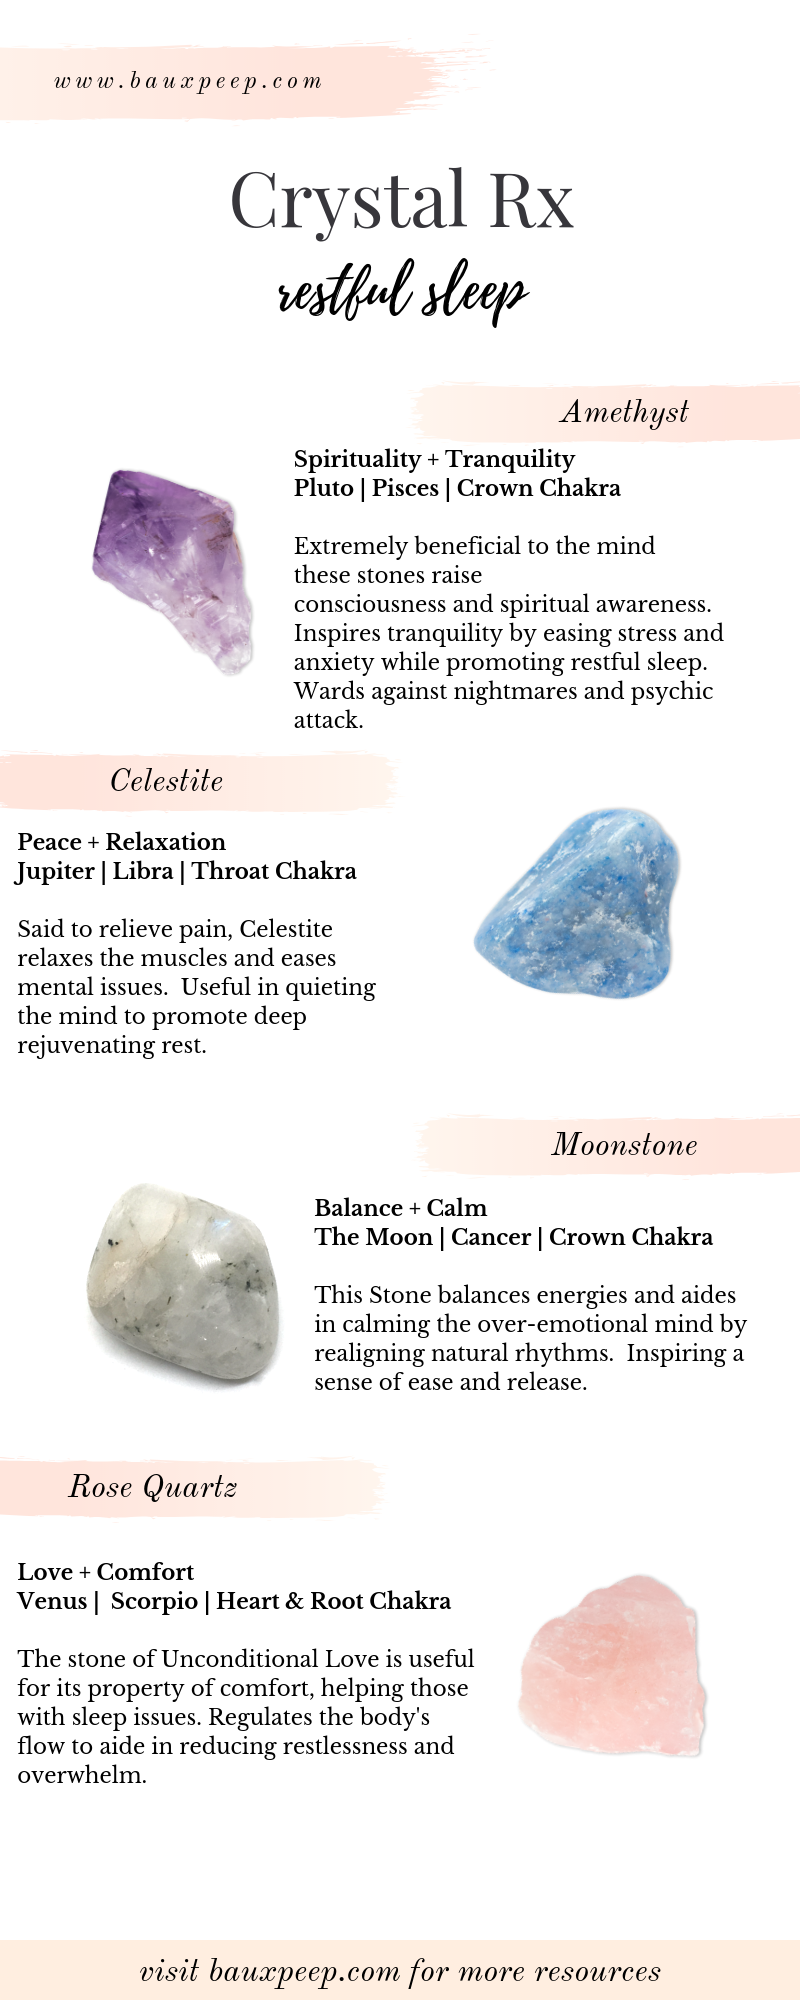 Gemstone Healing Stones Kit 12 Stones Velvet Bag Get them while they last